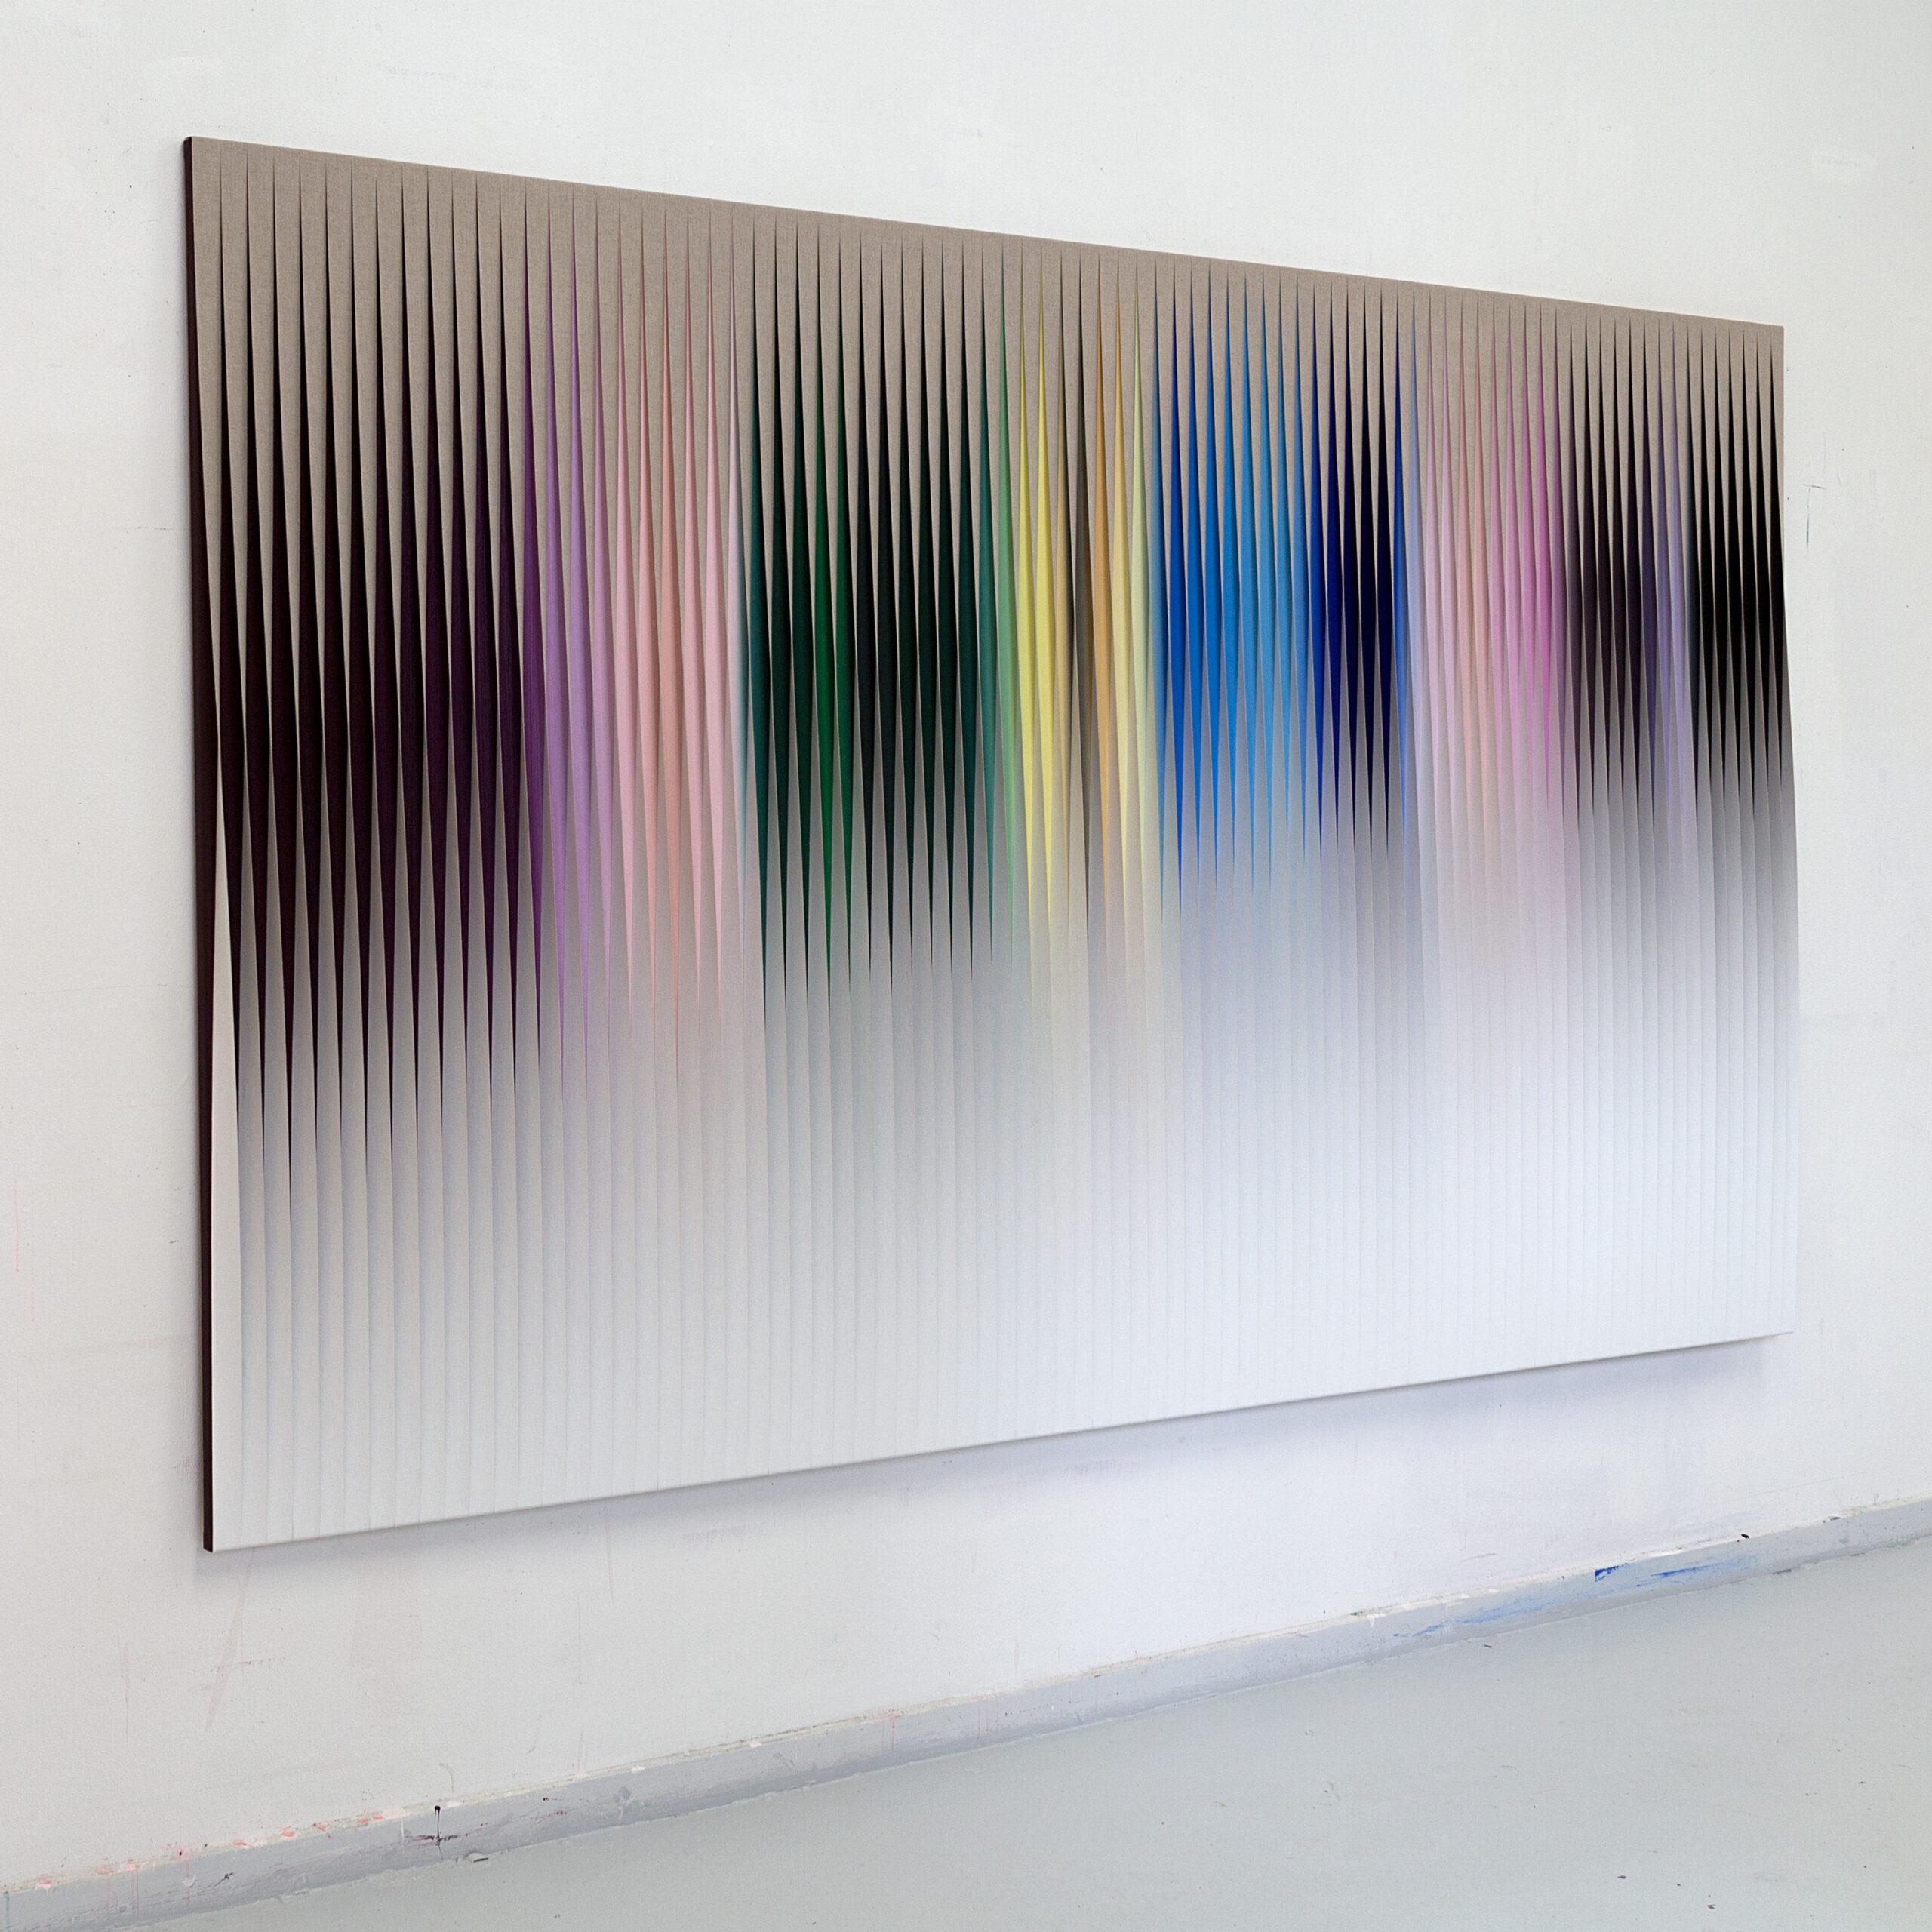 5021044-150×250-oil-raw-canvas-2021-55.000kr-side1